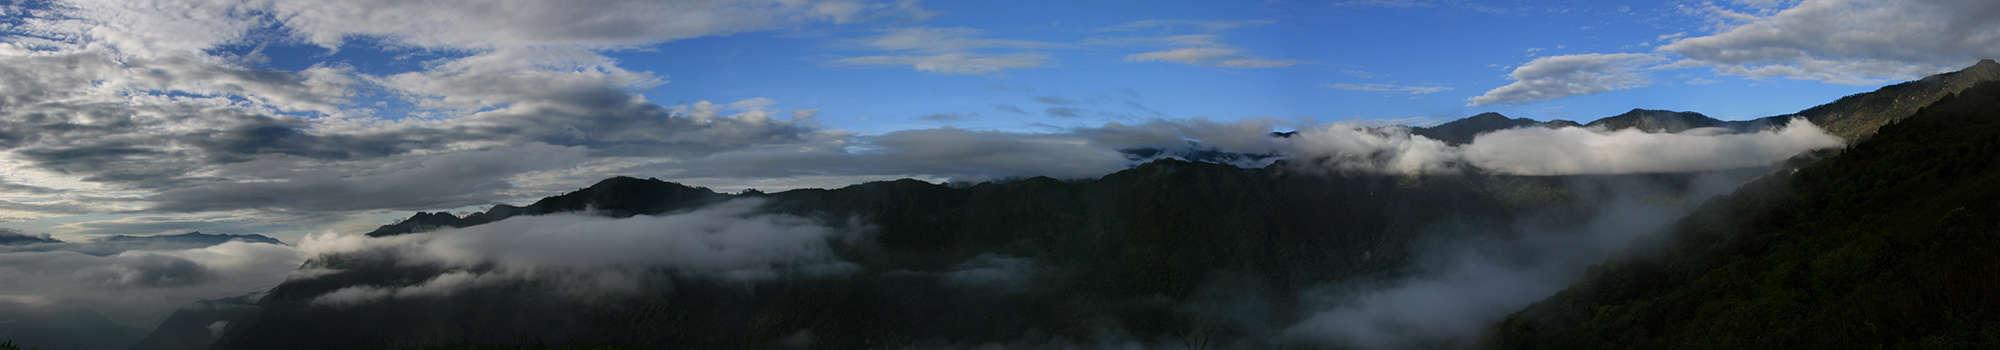 GHT East Bhutan Rodung La